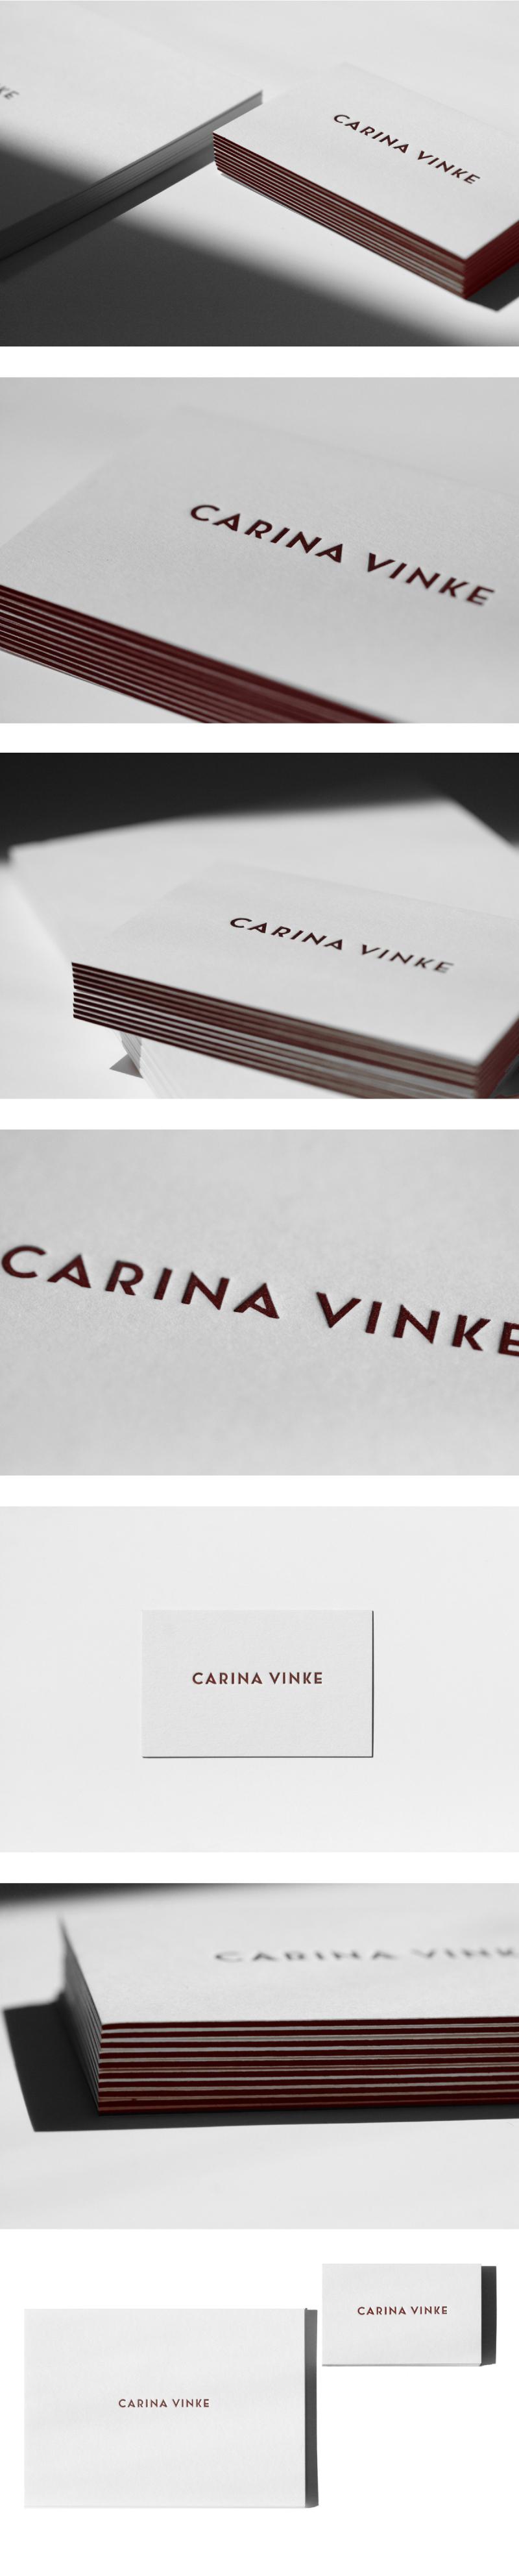 Carina Vinke alt – 凸版简约定制名片